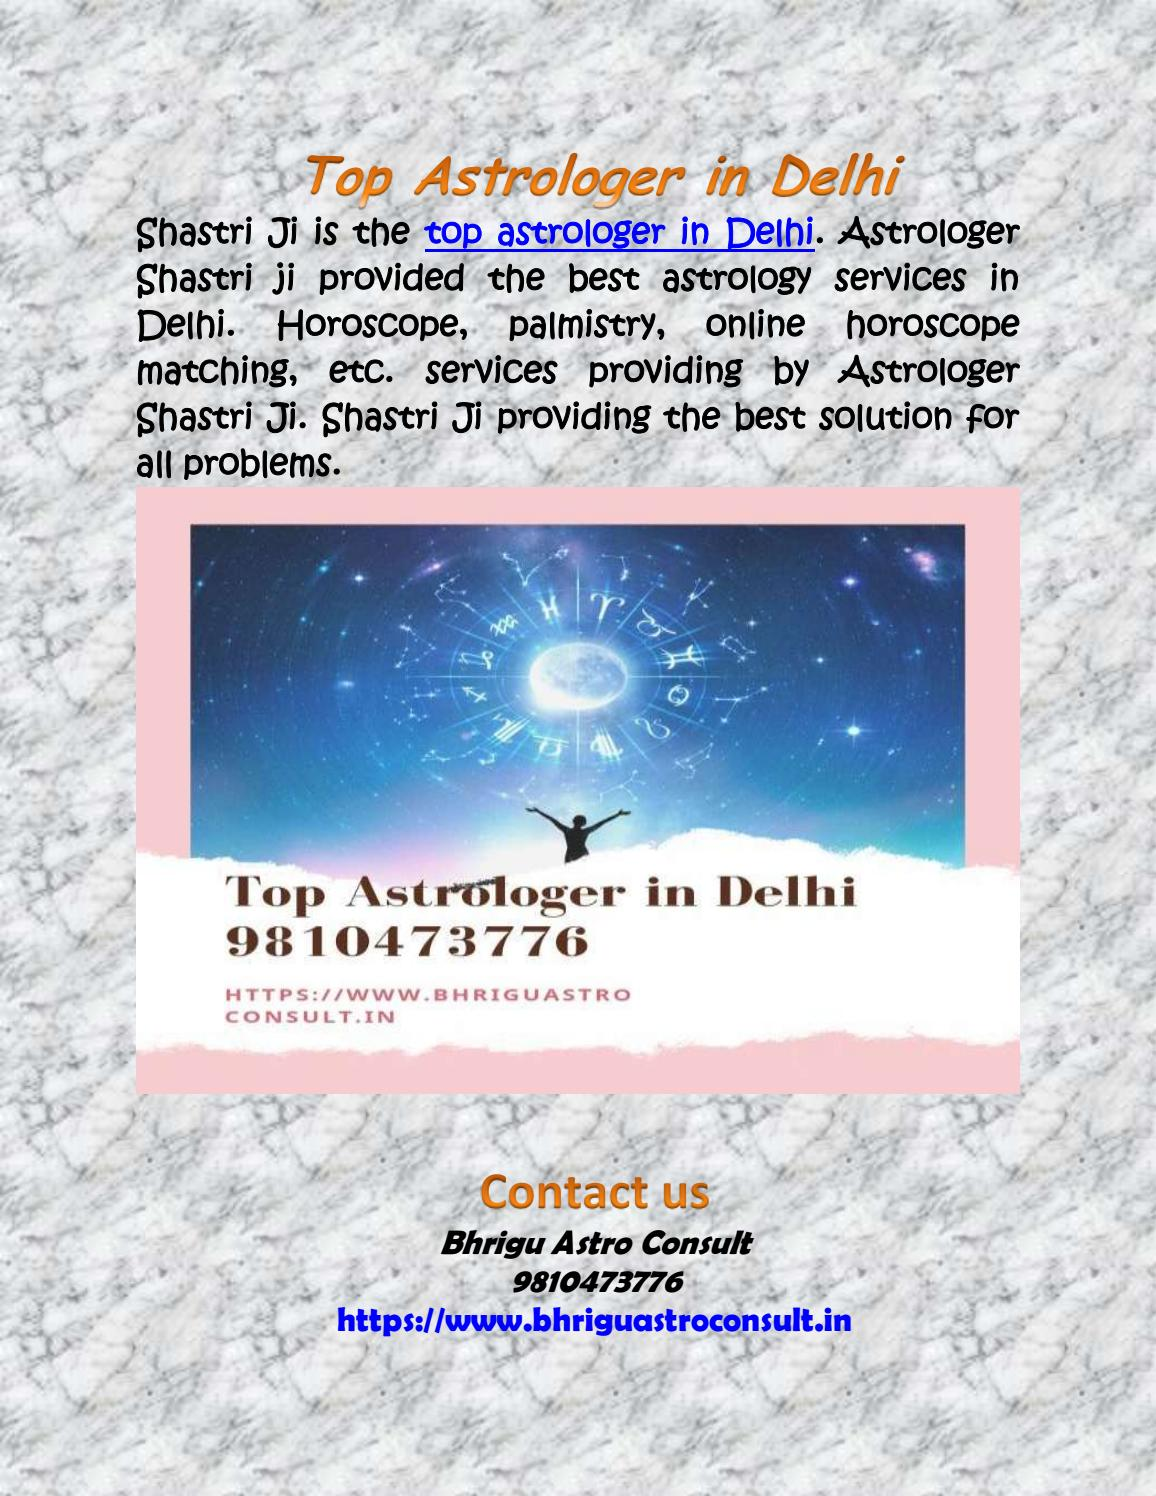 astrologer a.k shastri ji